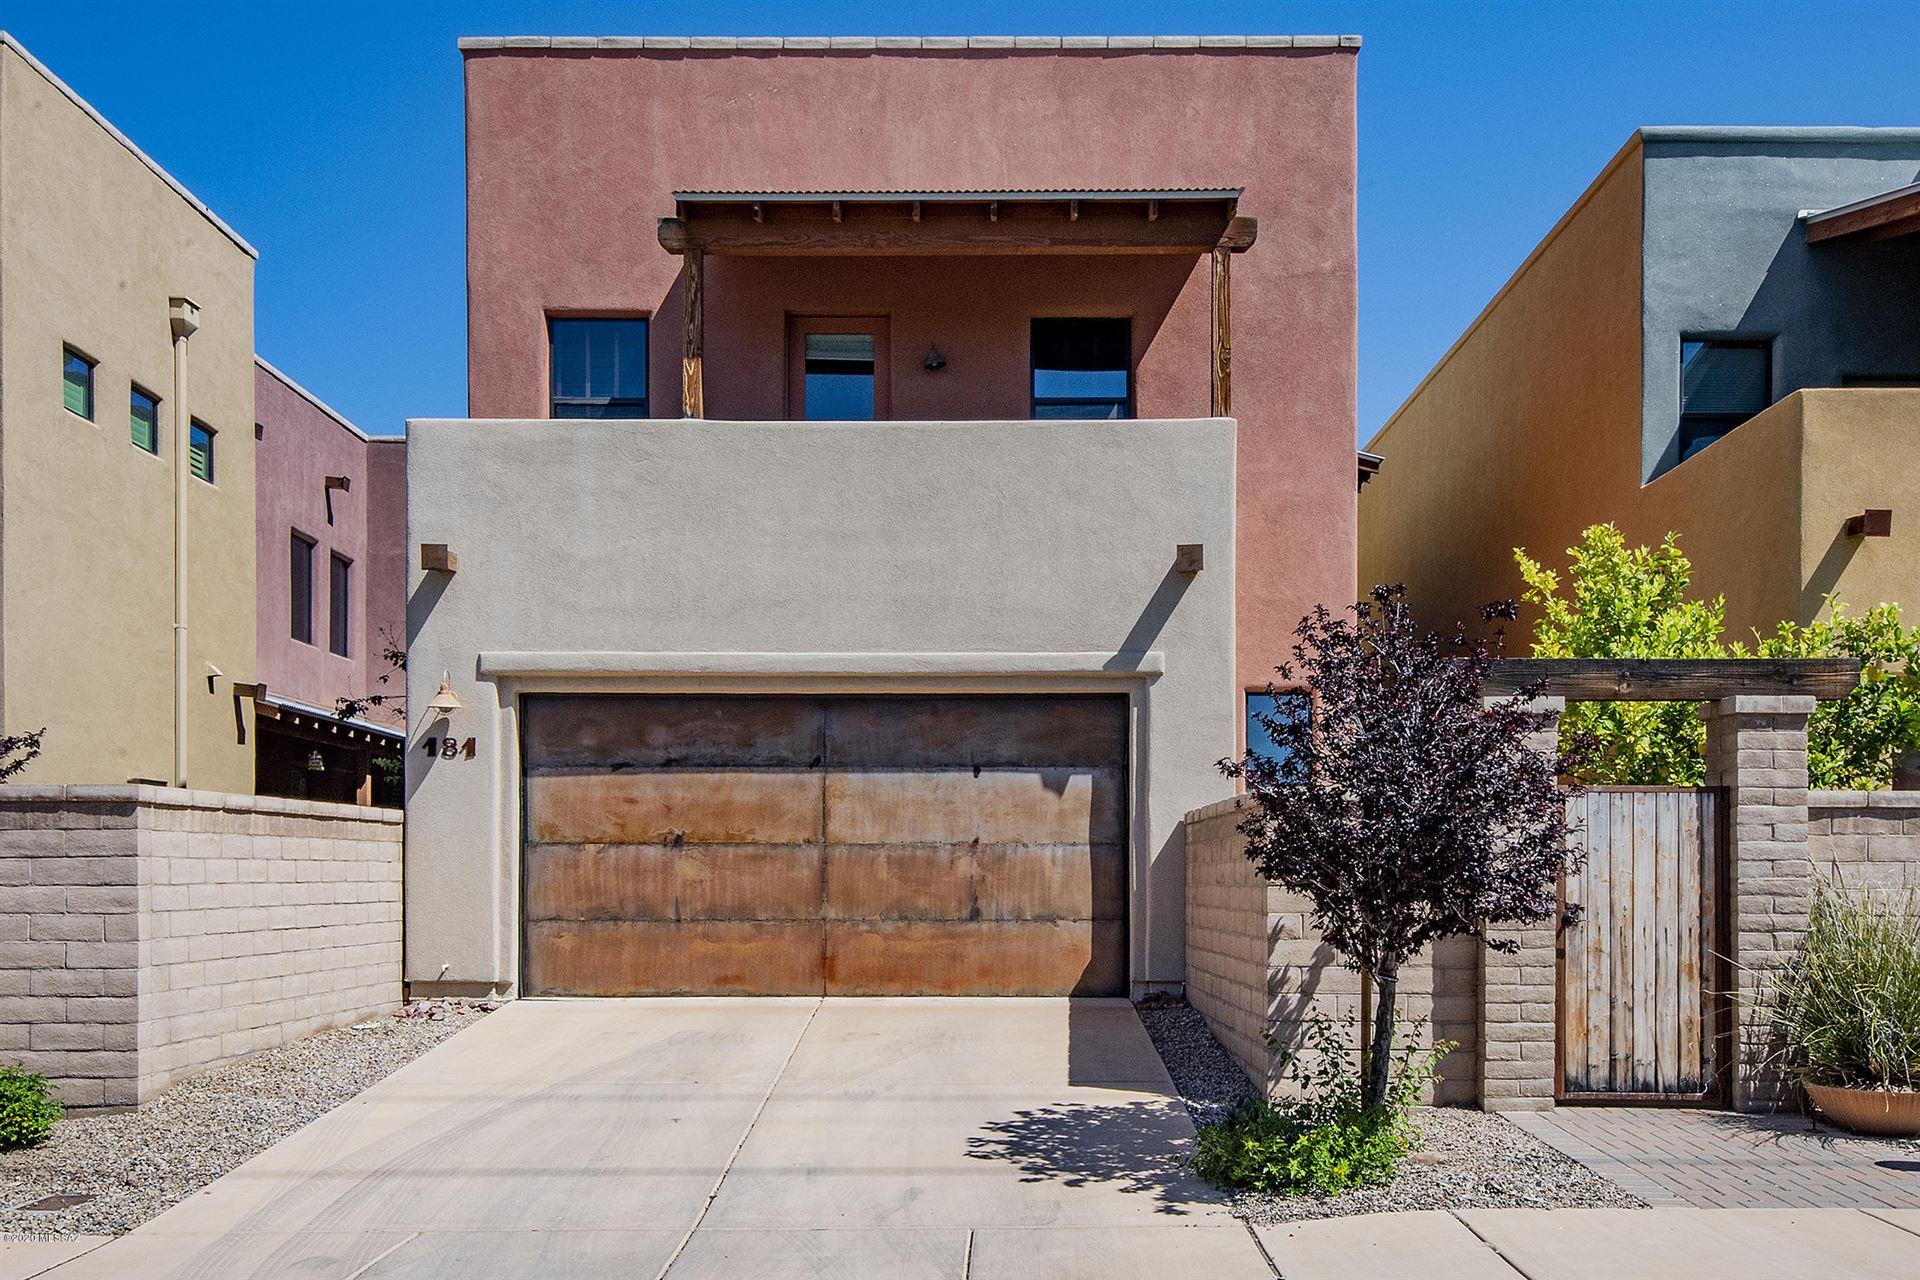 181 E Calderwood Road, Tucson, AZ 85704 - MLS#: 22010634